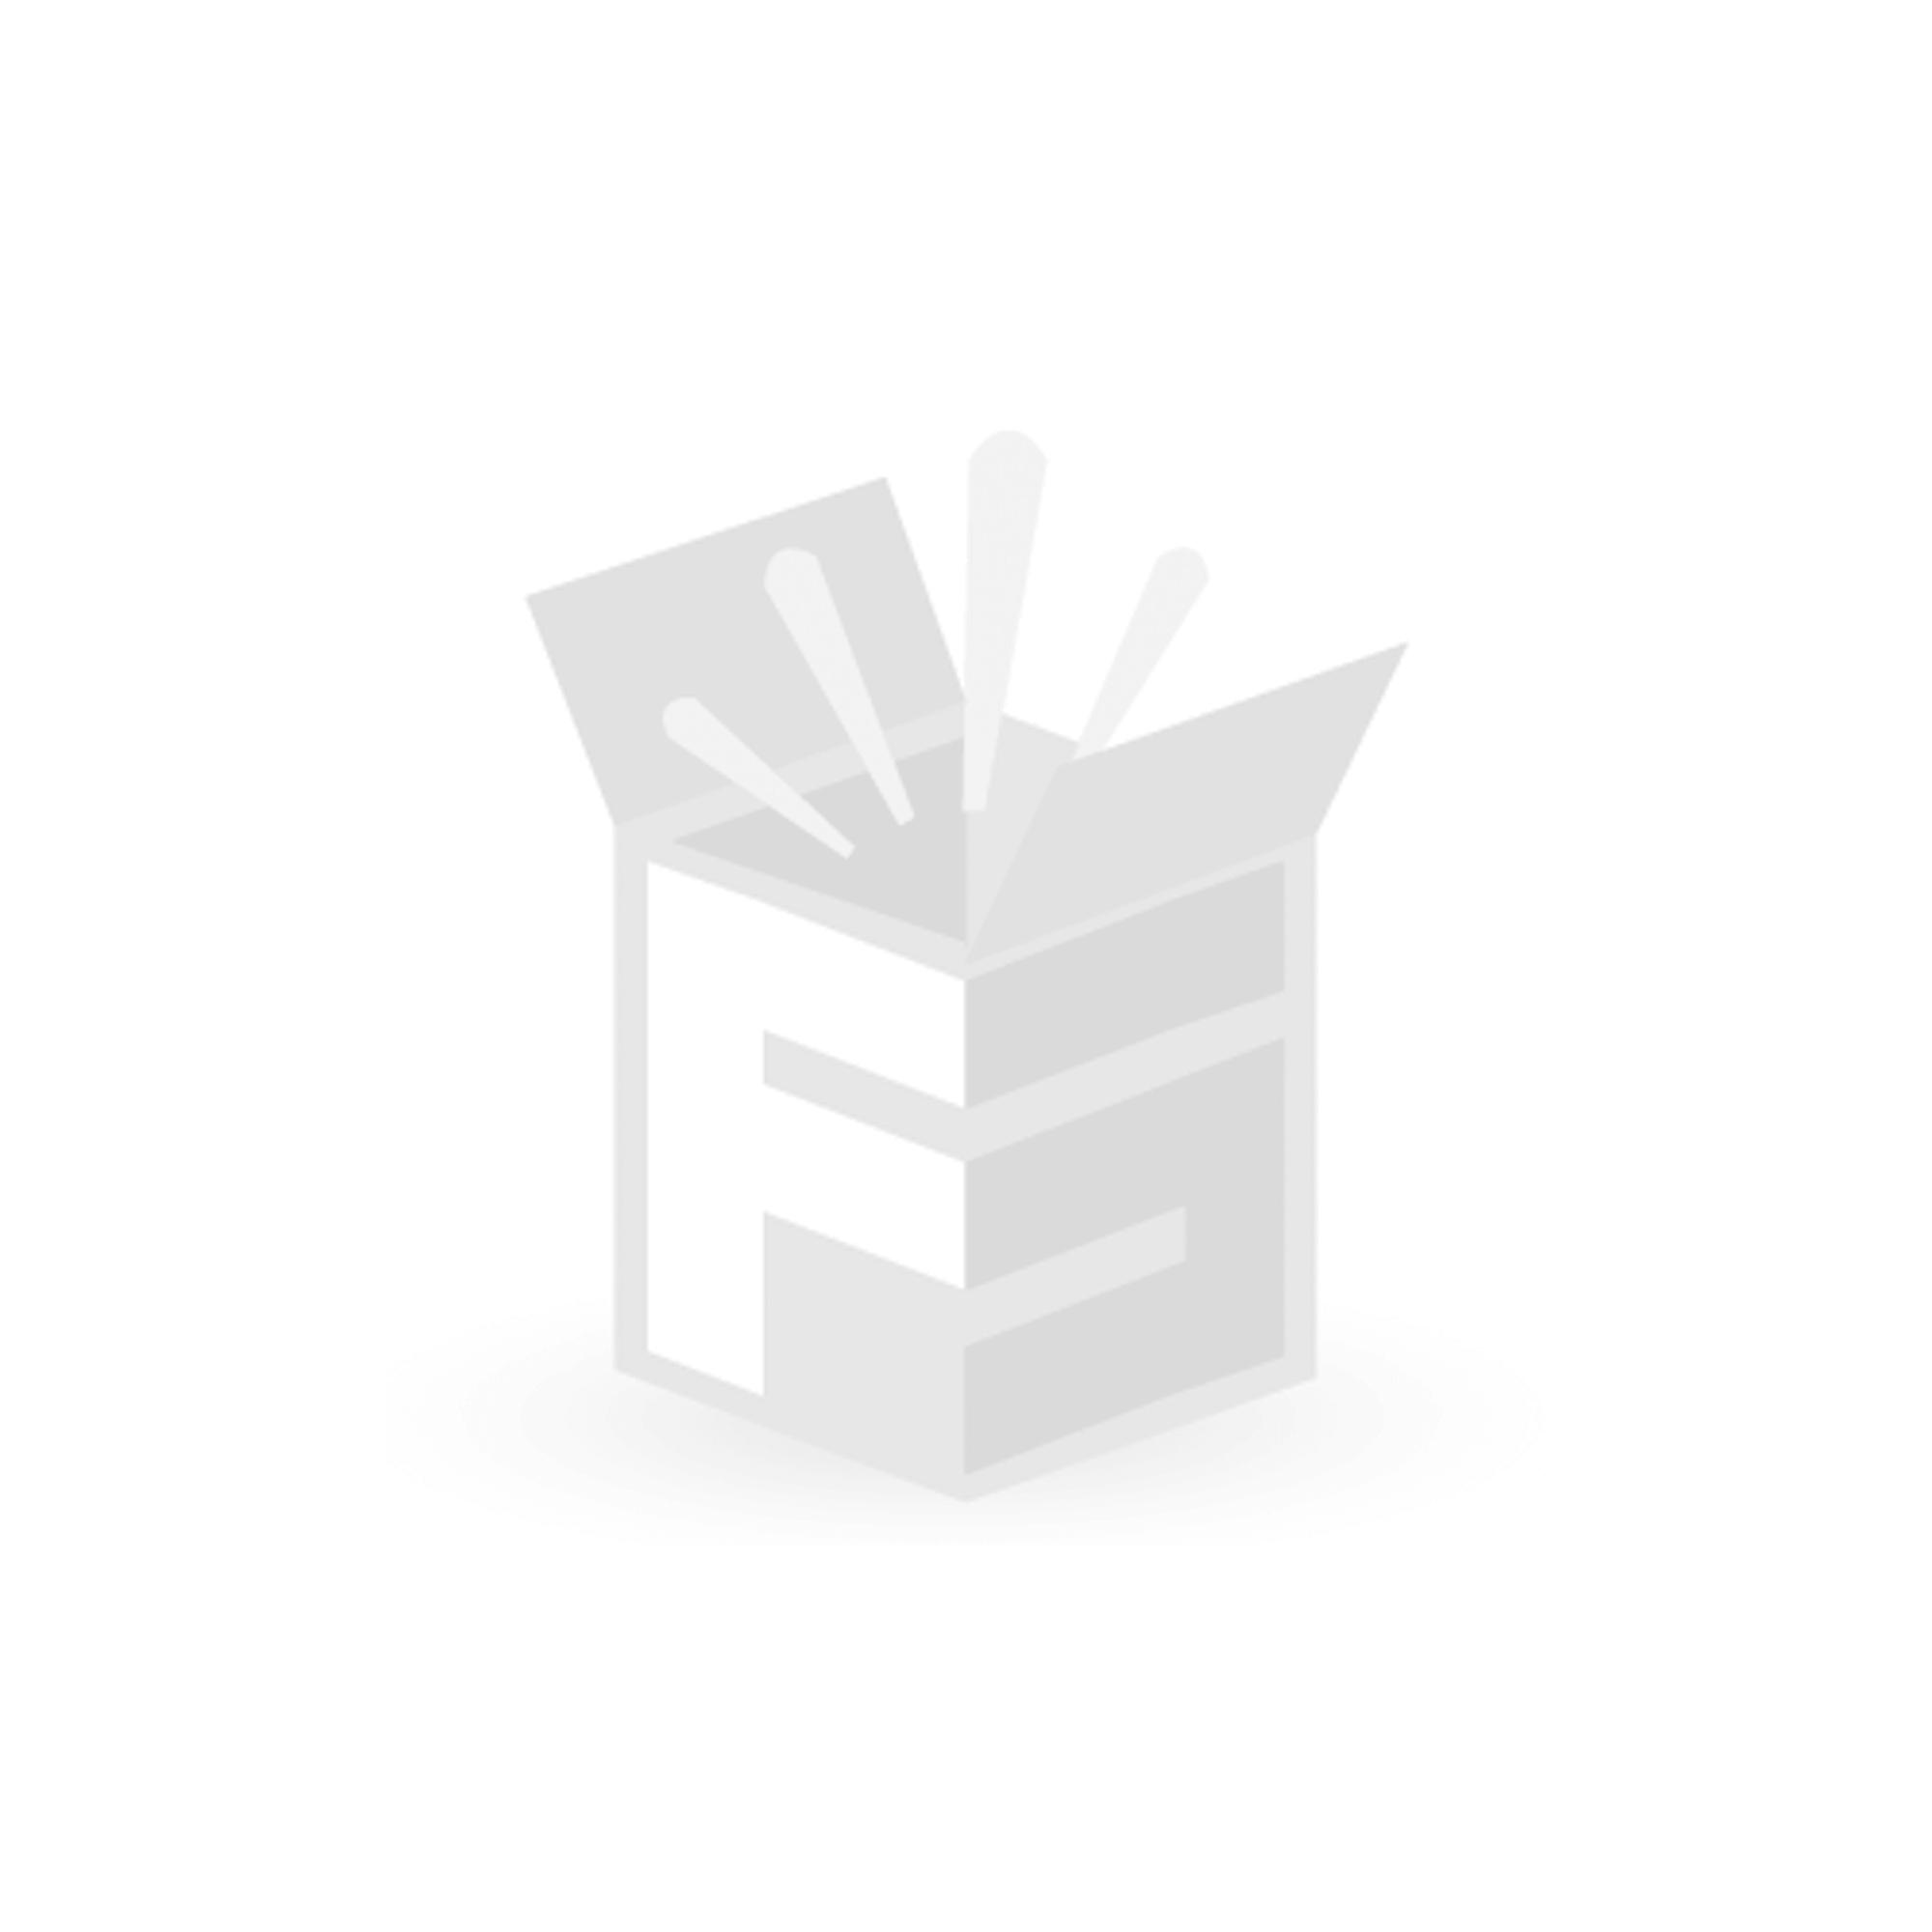 Kibernetik Prise SC 1x CEE32A, 5 pôles